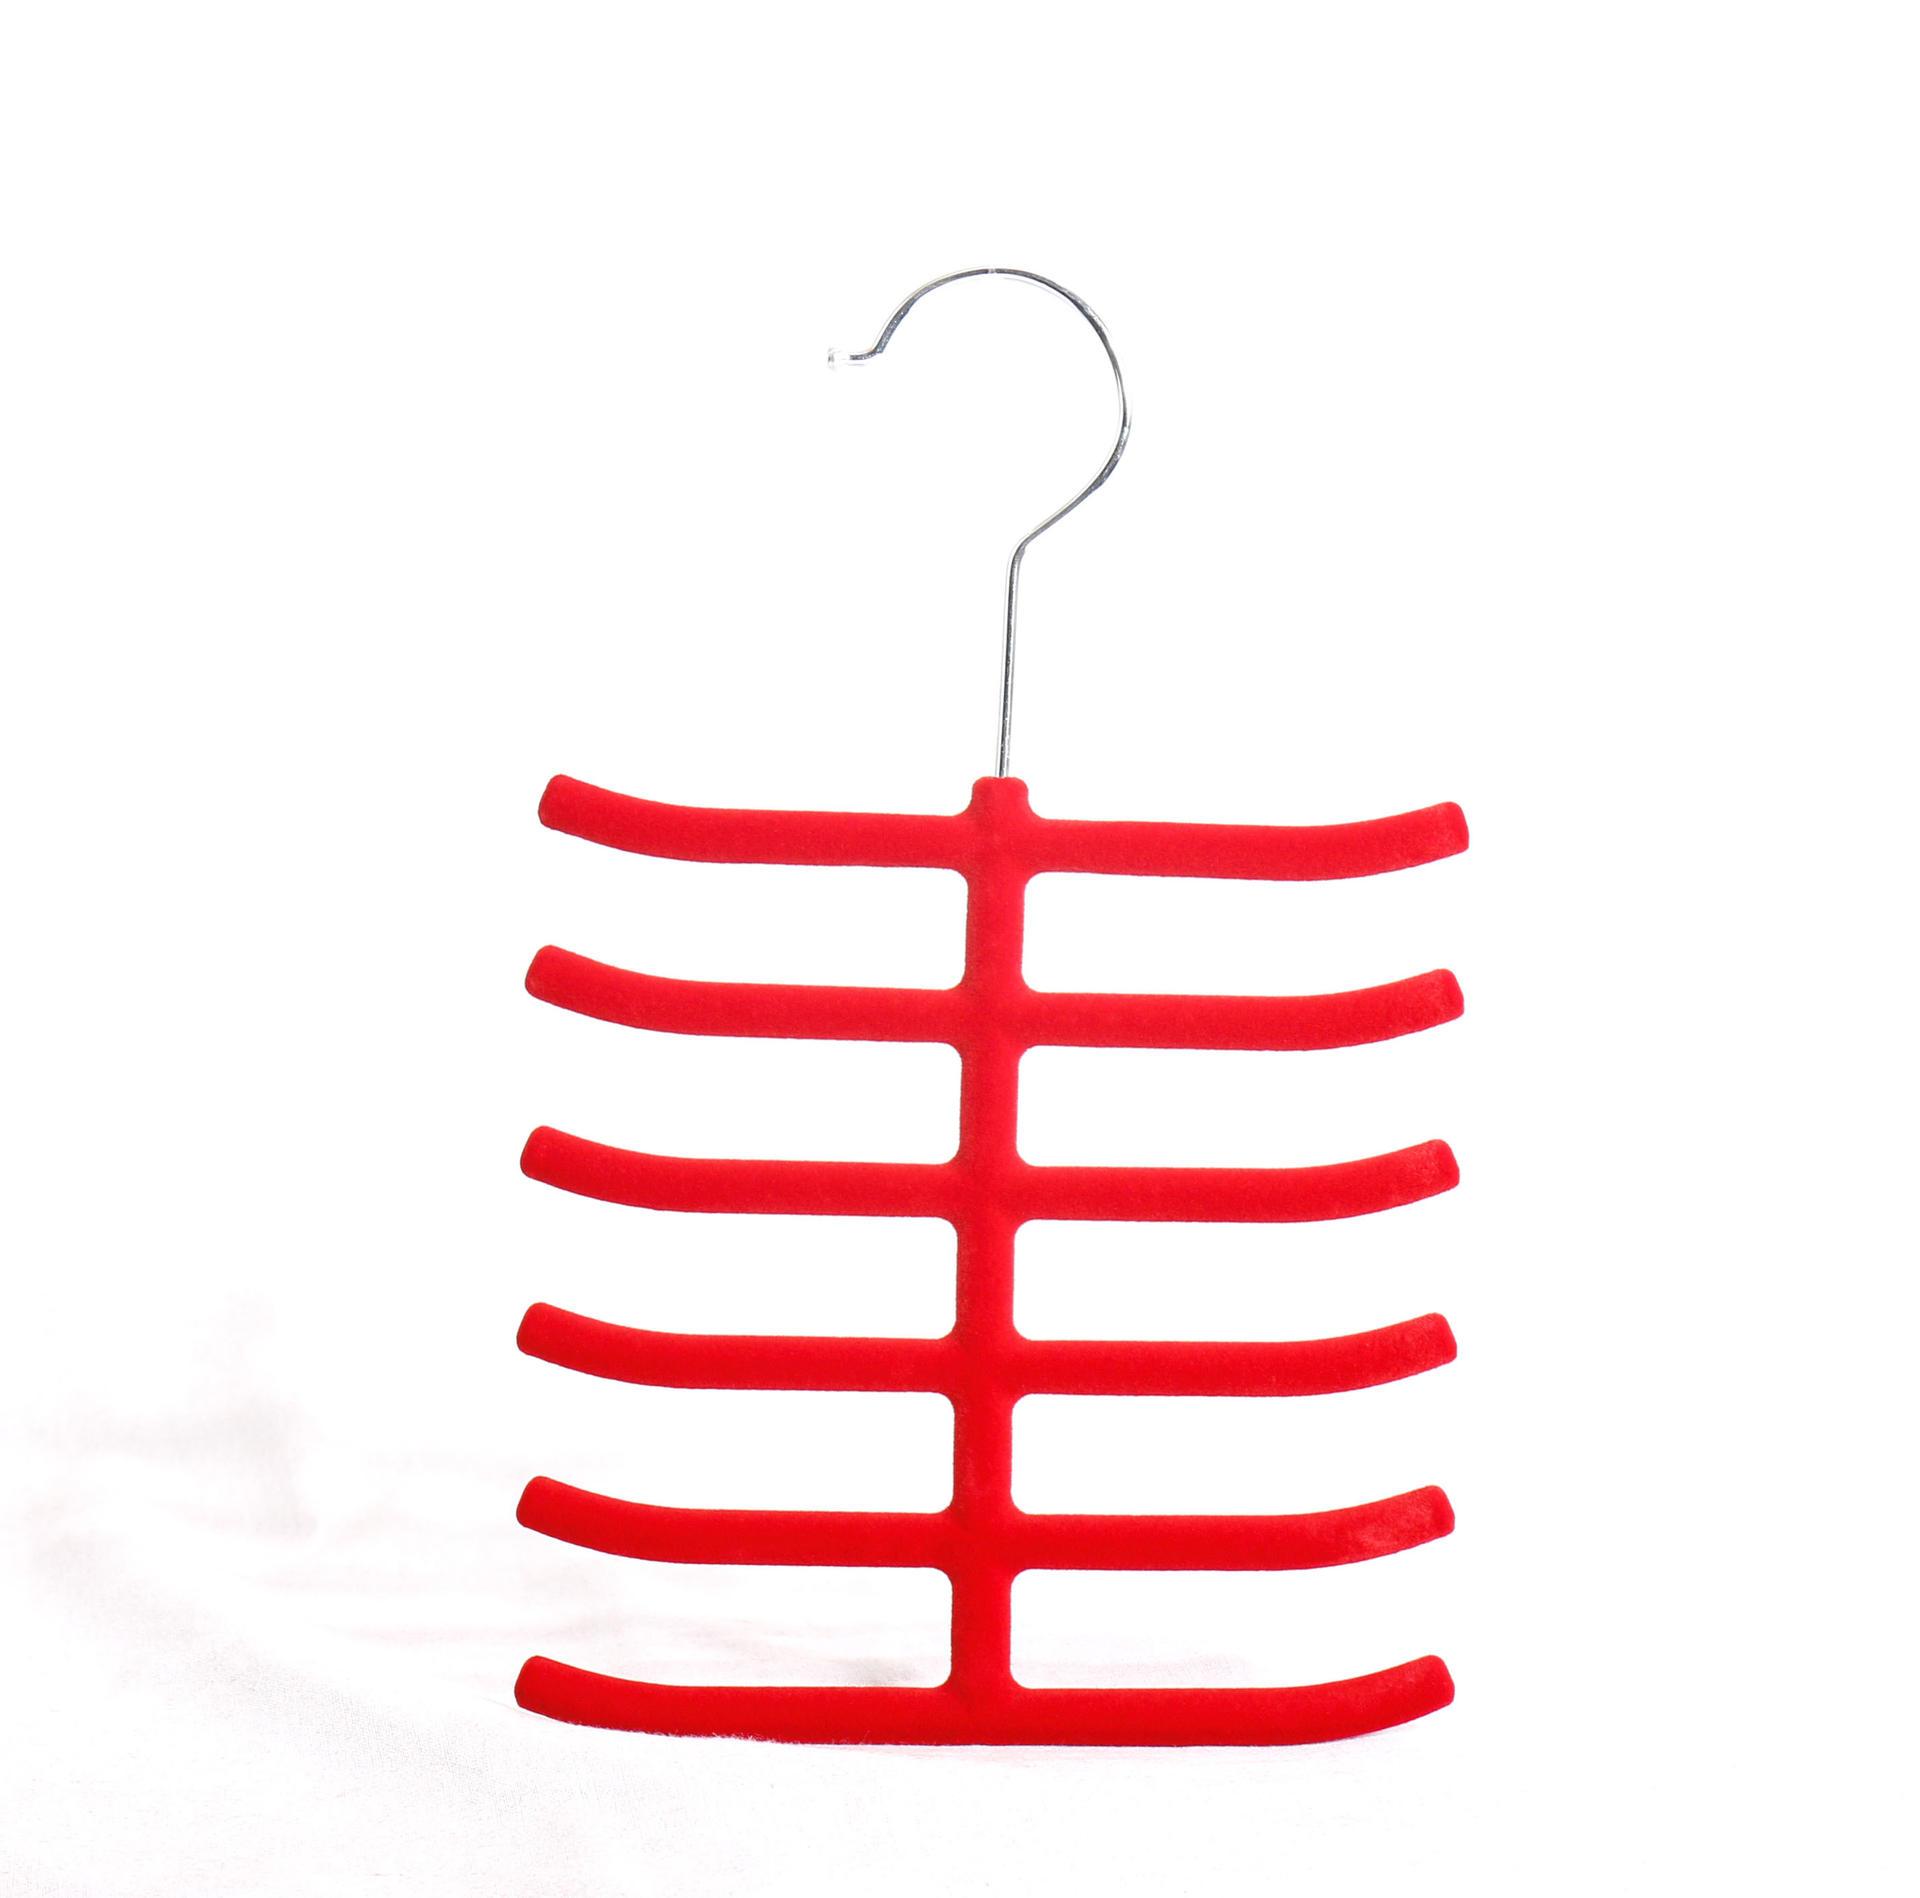 Plastic velvet scarf hanger for display tie/scarves